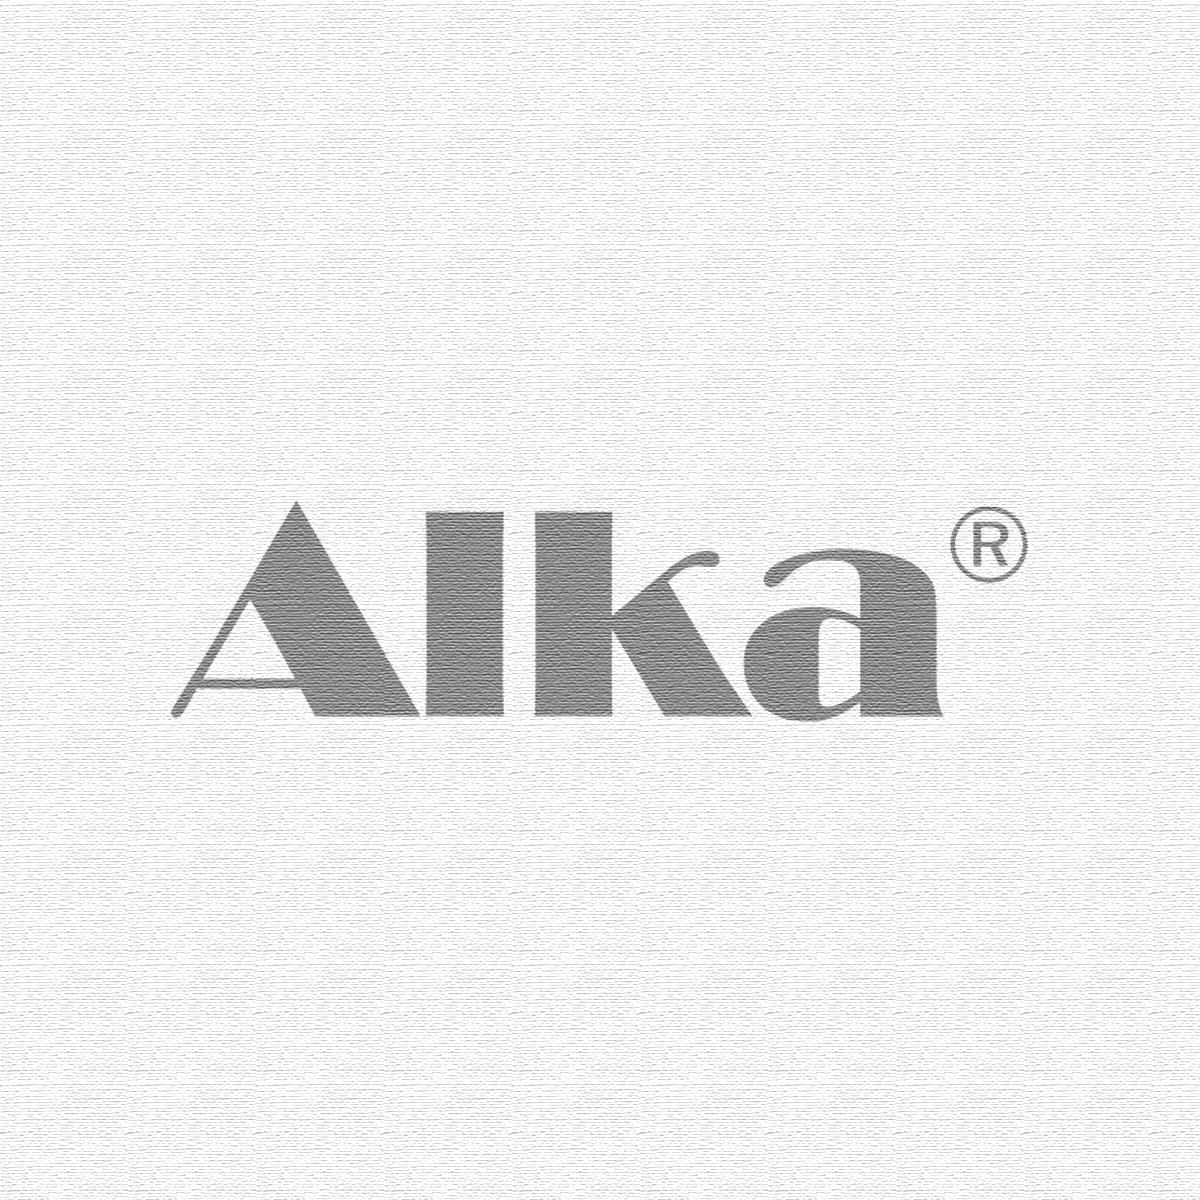 Alka® Bad - 1200g - Basisch badzout - ontzurend badzout - ontzuren - natriumbicarbonaat - Alka®